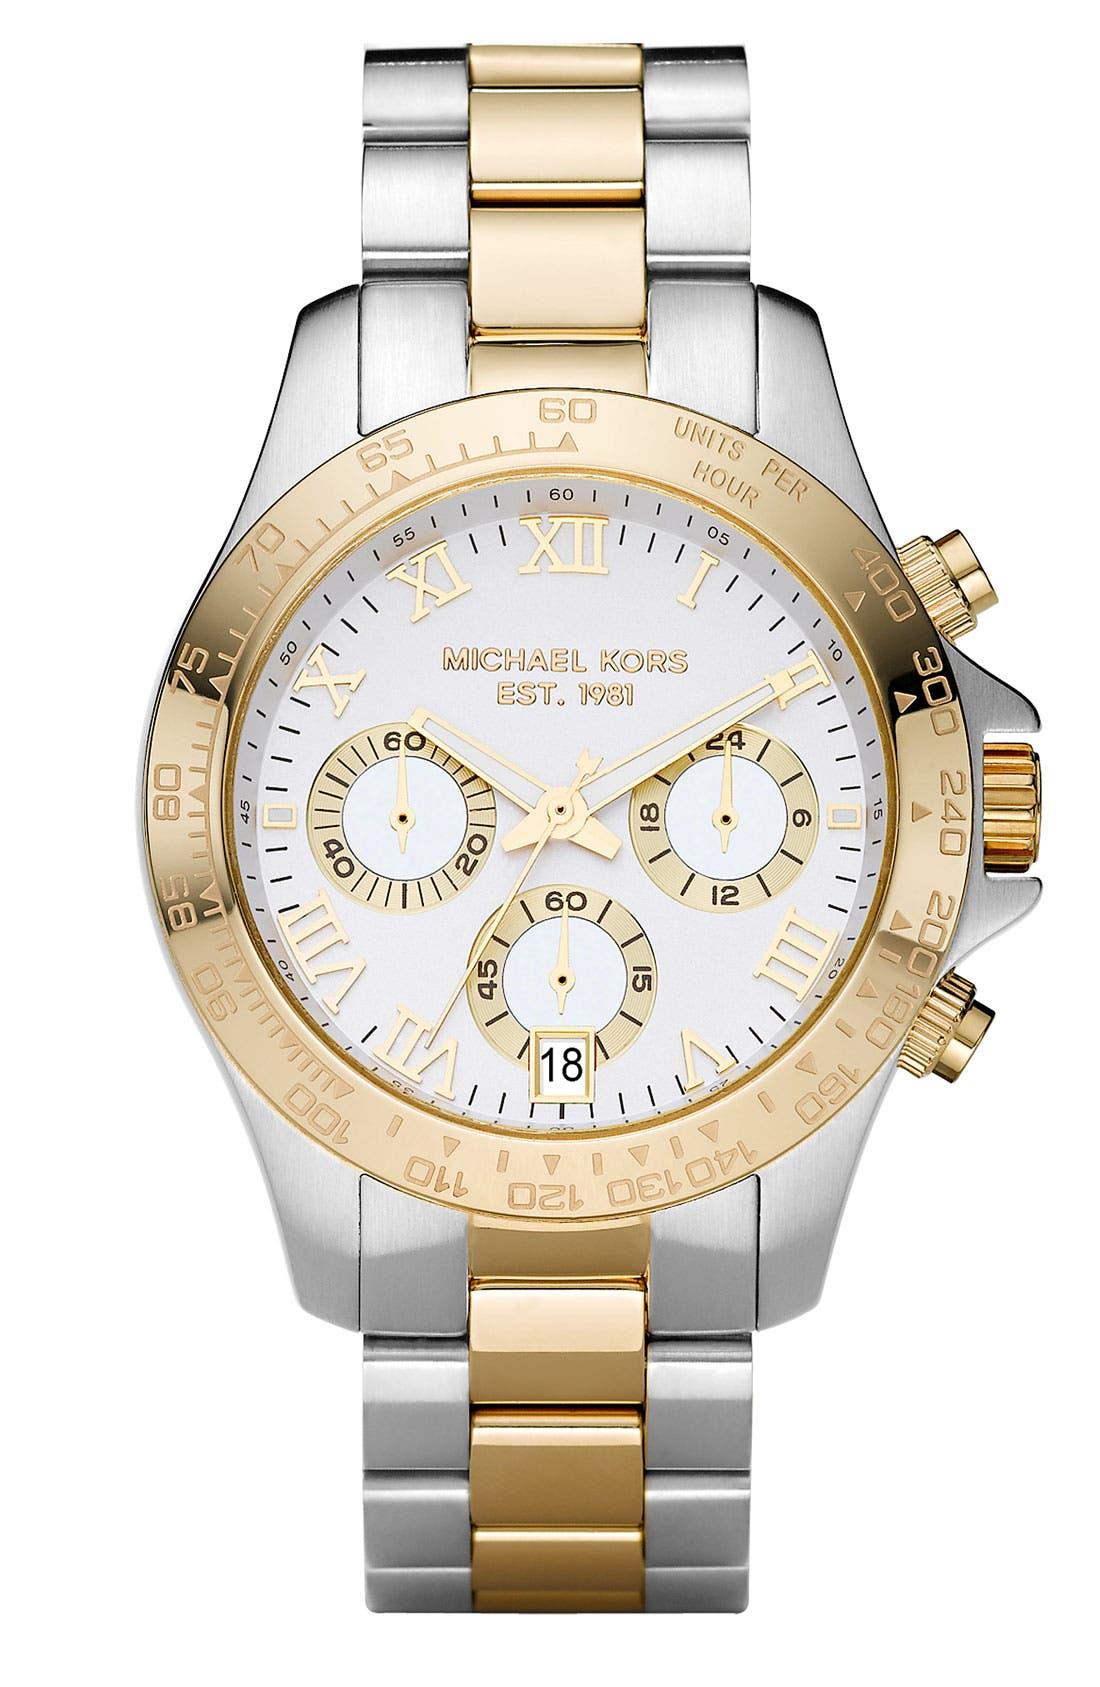 Main Image - Michael Kors 'Small Layton' Chronograph Watch, 38mm